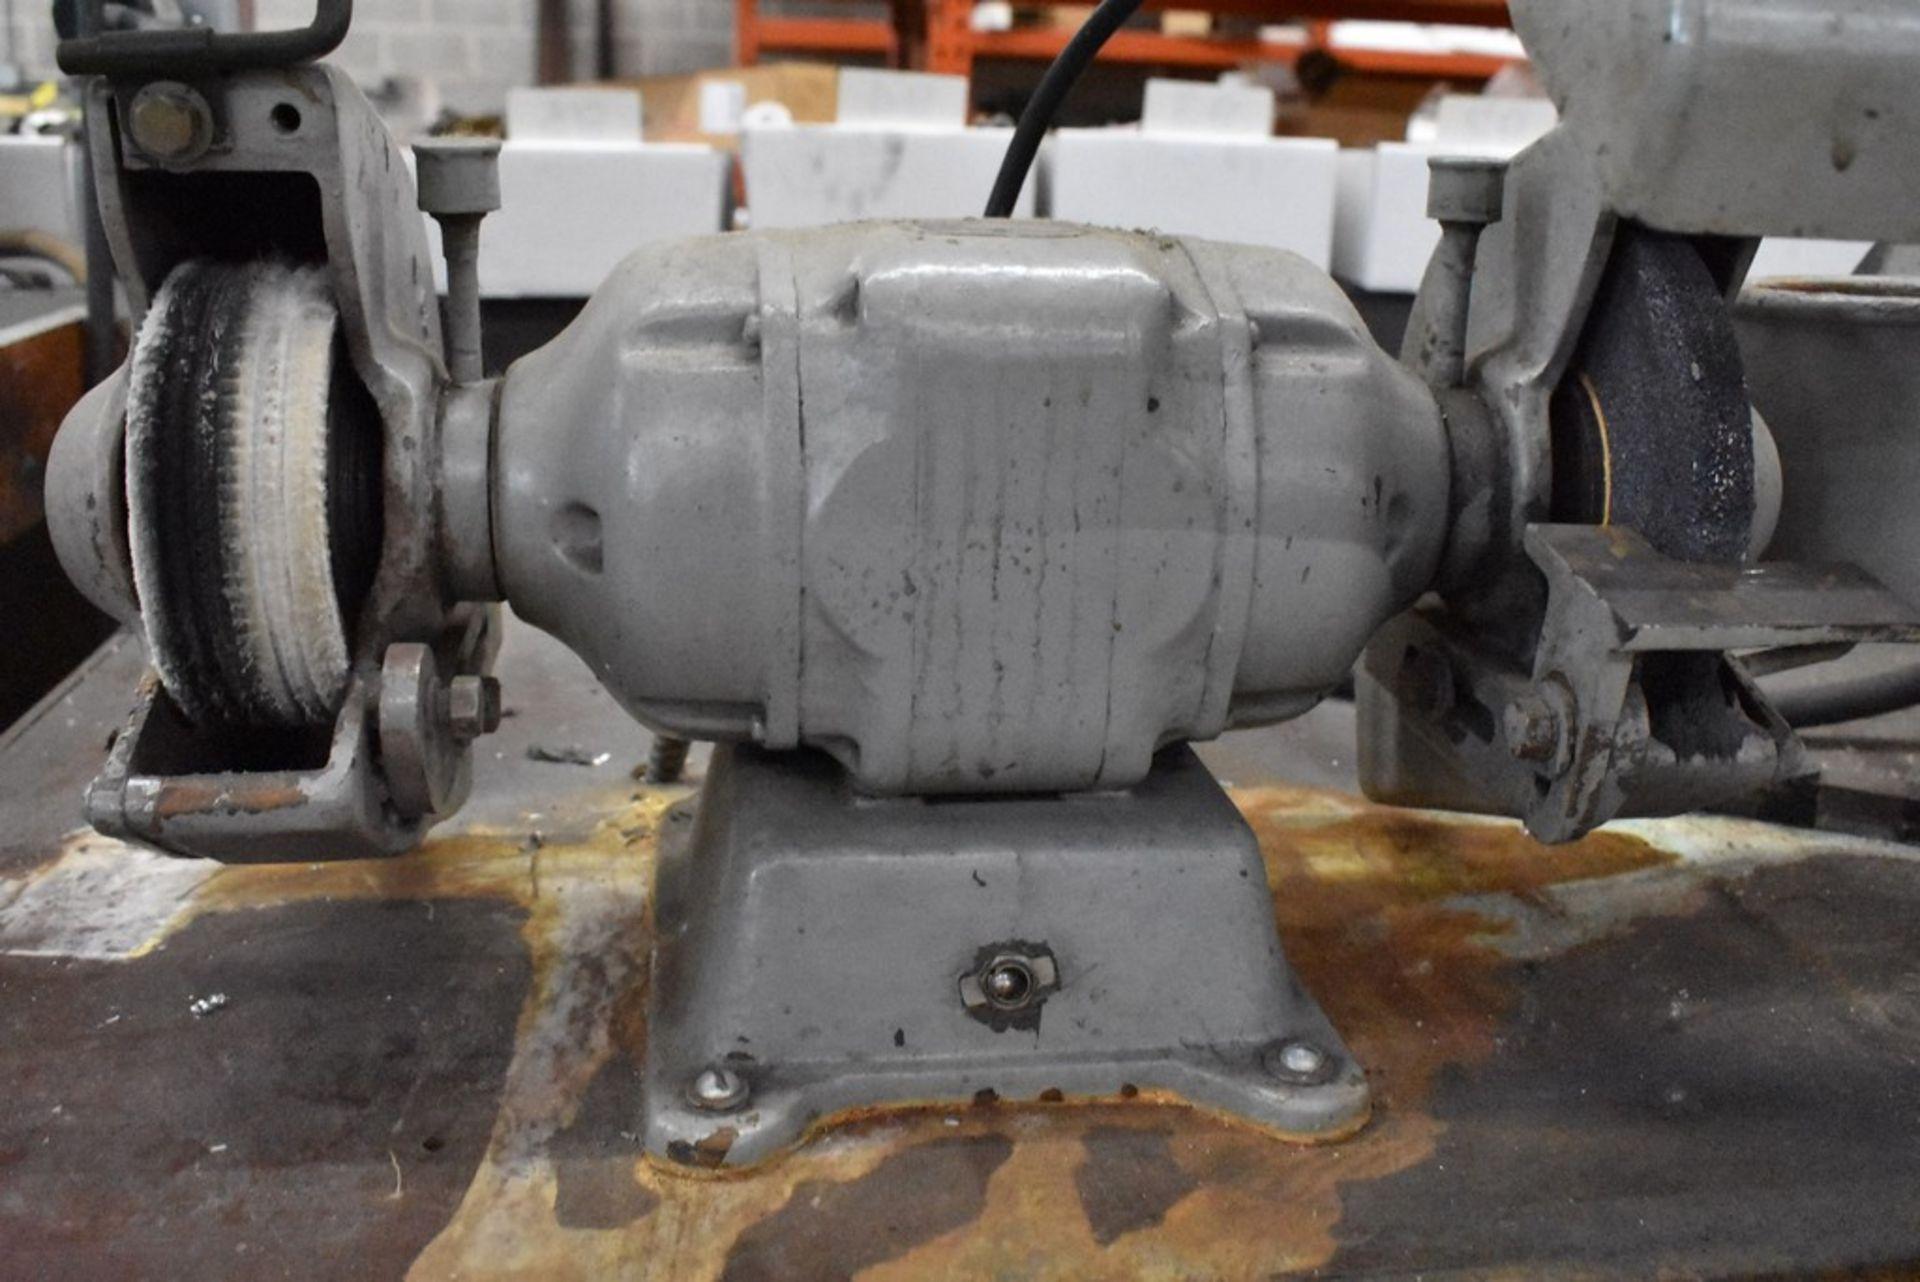 "BADLOR 1/2 HP 6"" DOUBLE END GRINDER - Image 2 of 3"